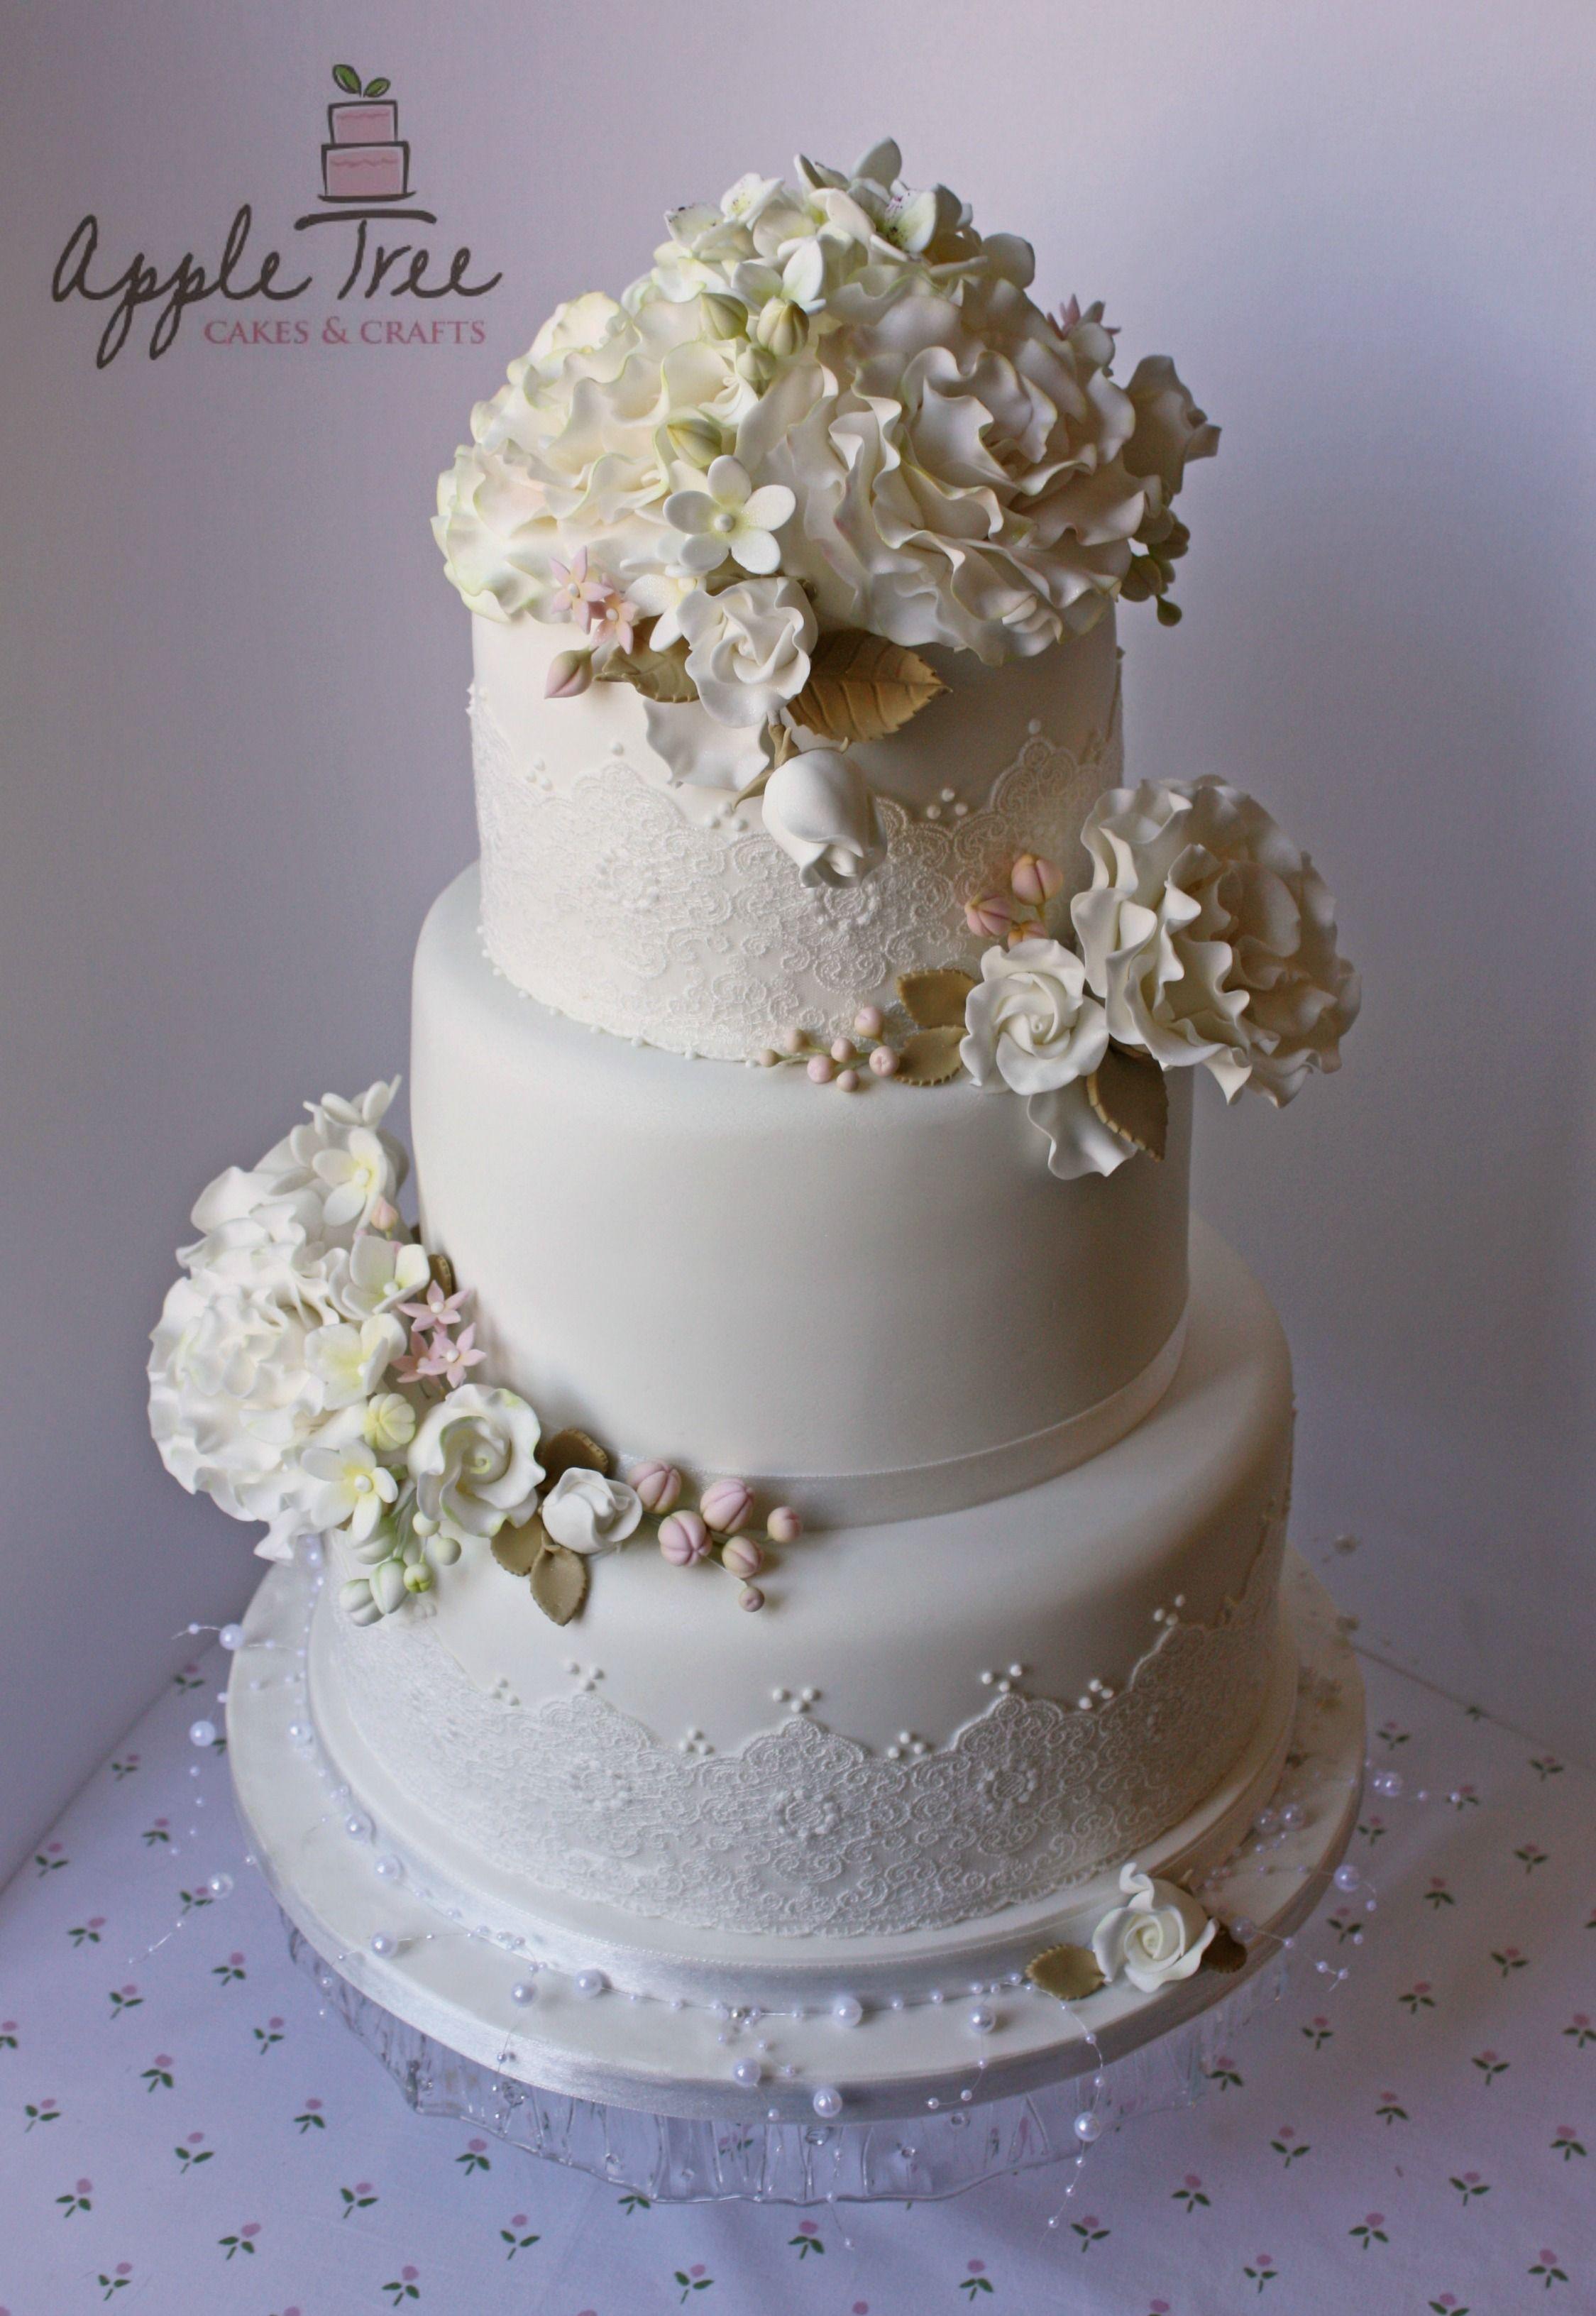 Apple Tree Cakes & Crafts on Pinterest   Tree Cakes, Sugar Flowers an